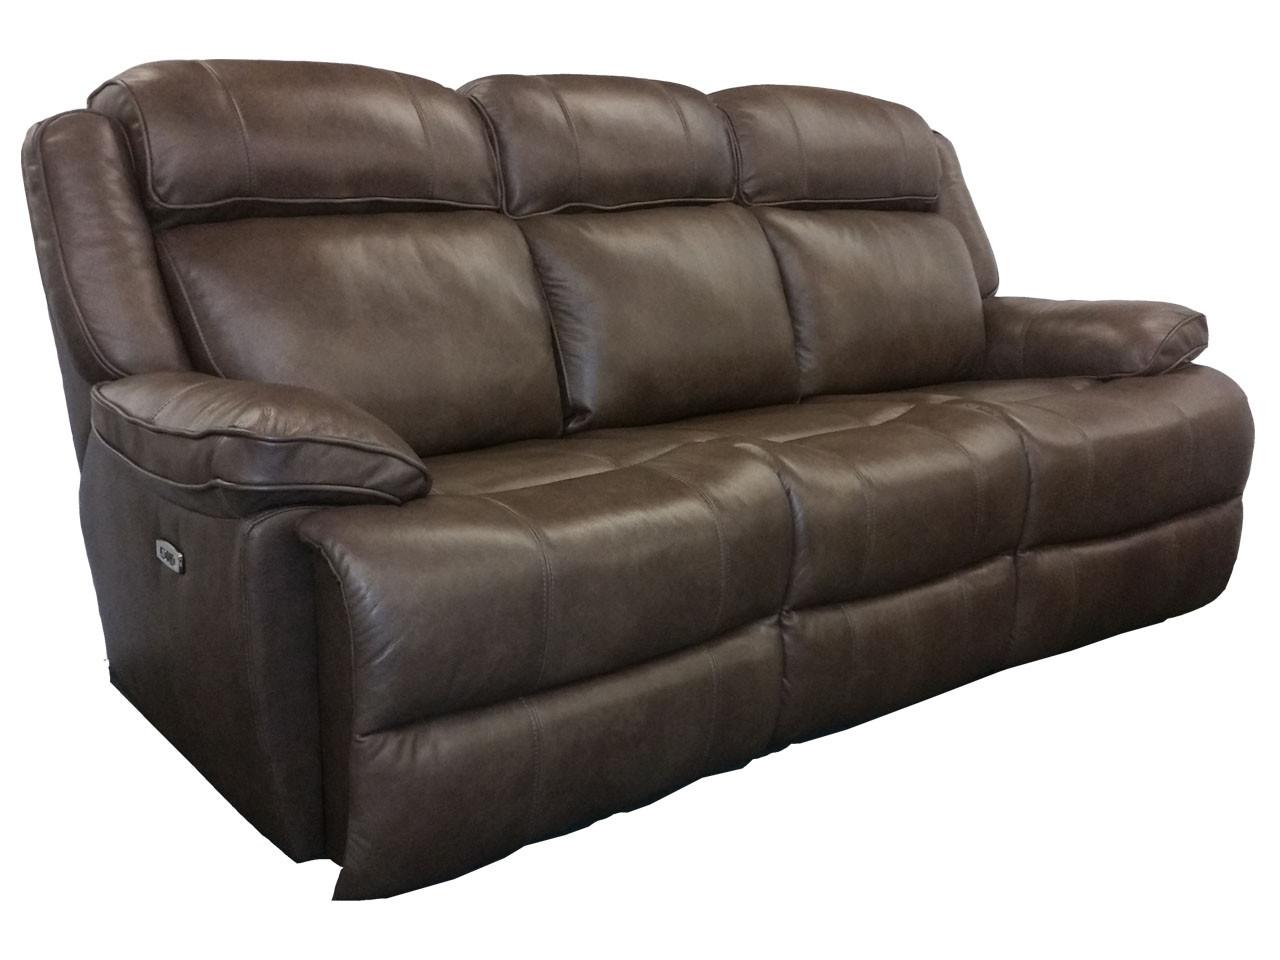 Avalon Power Reclining Sofa- Latte